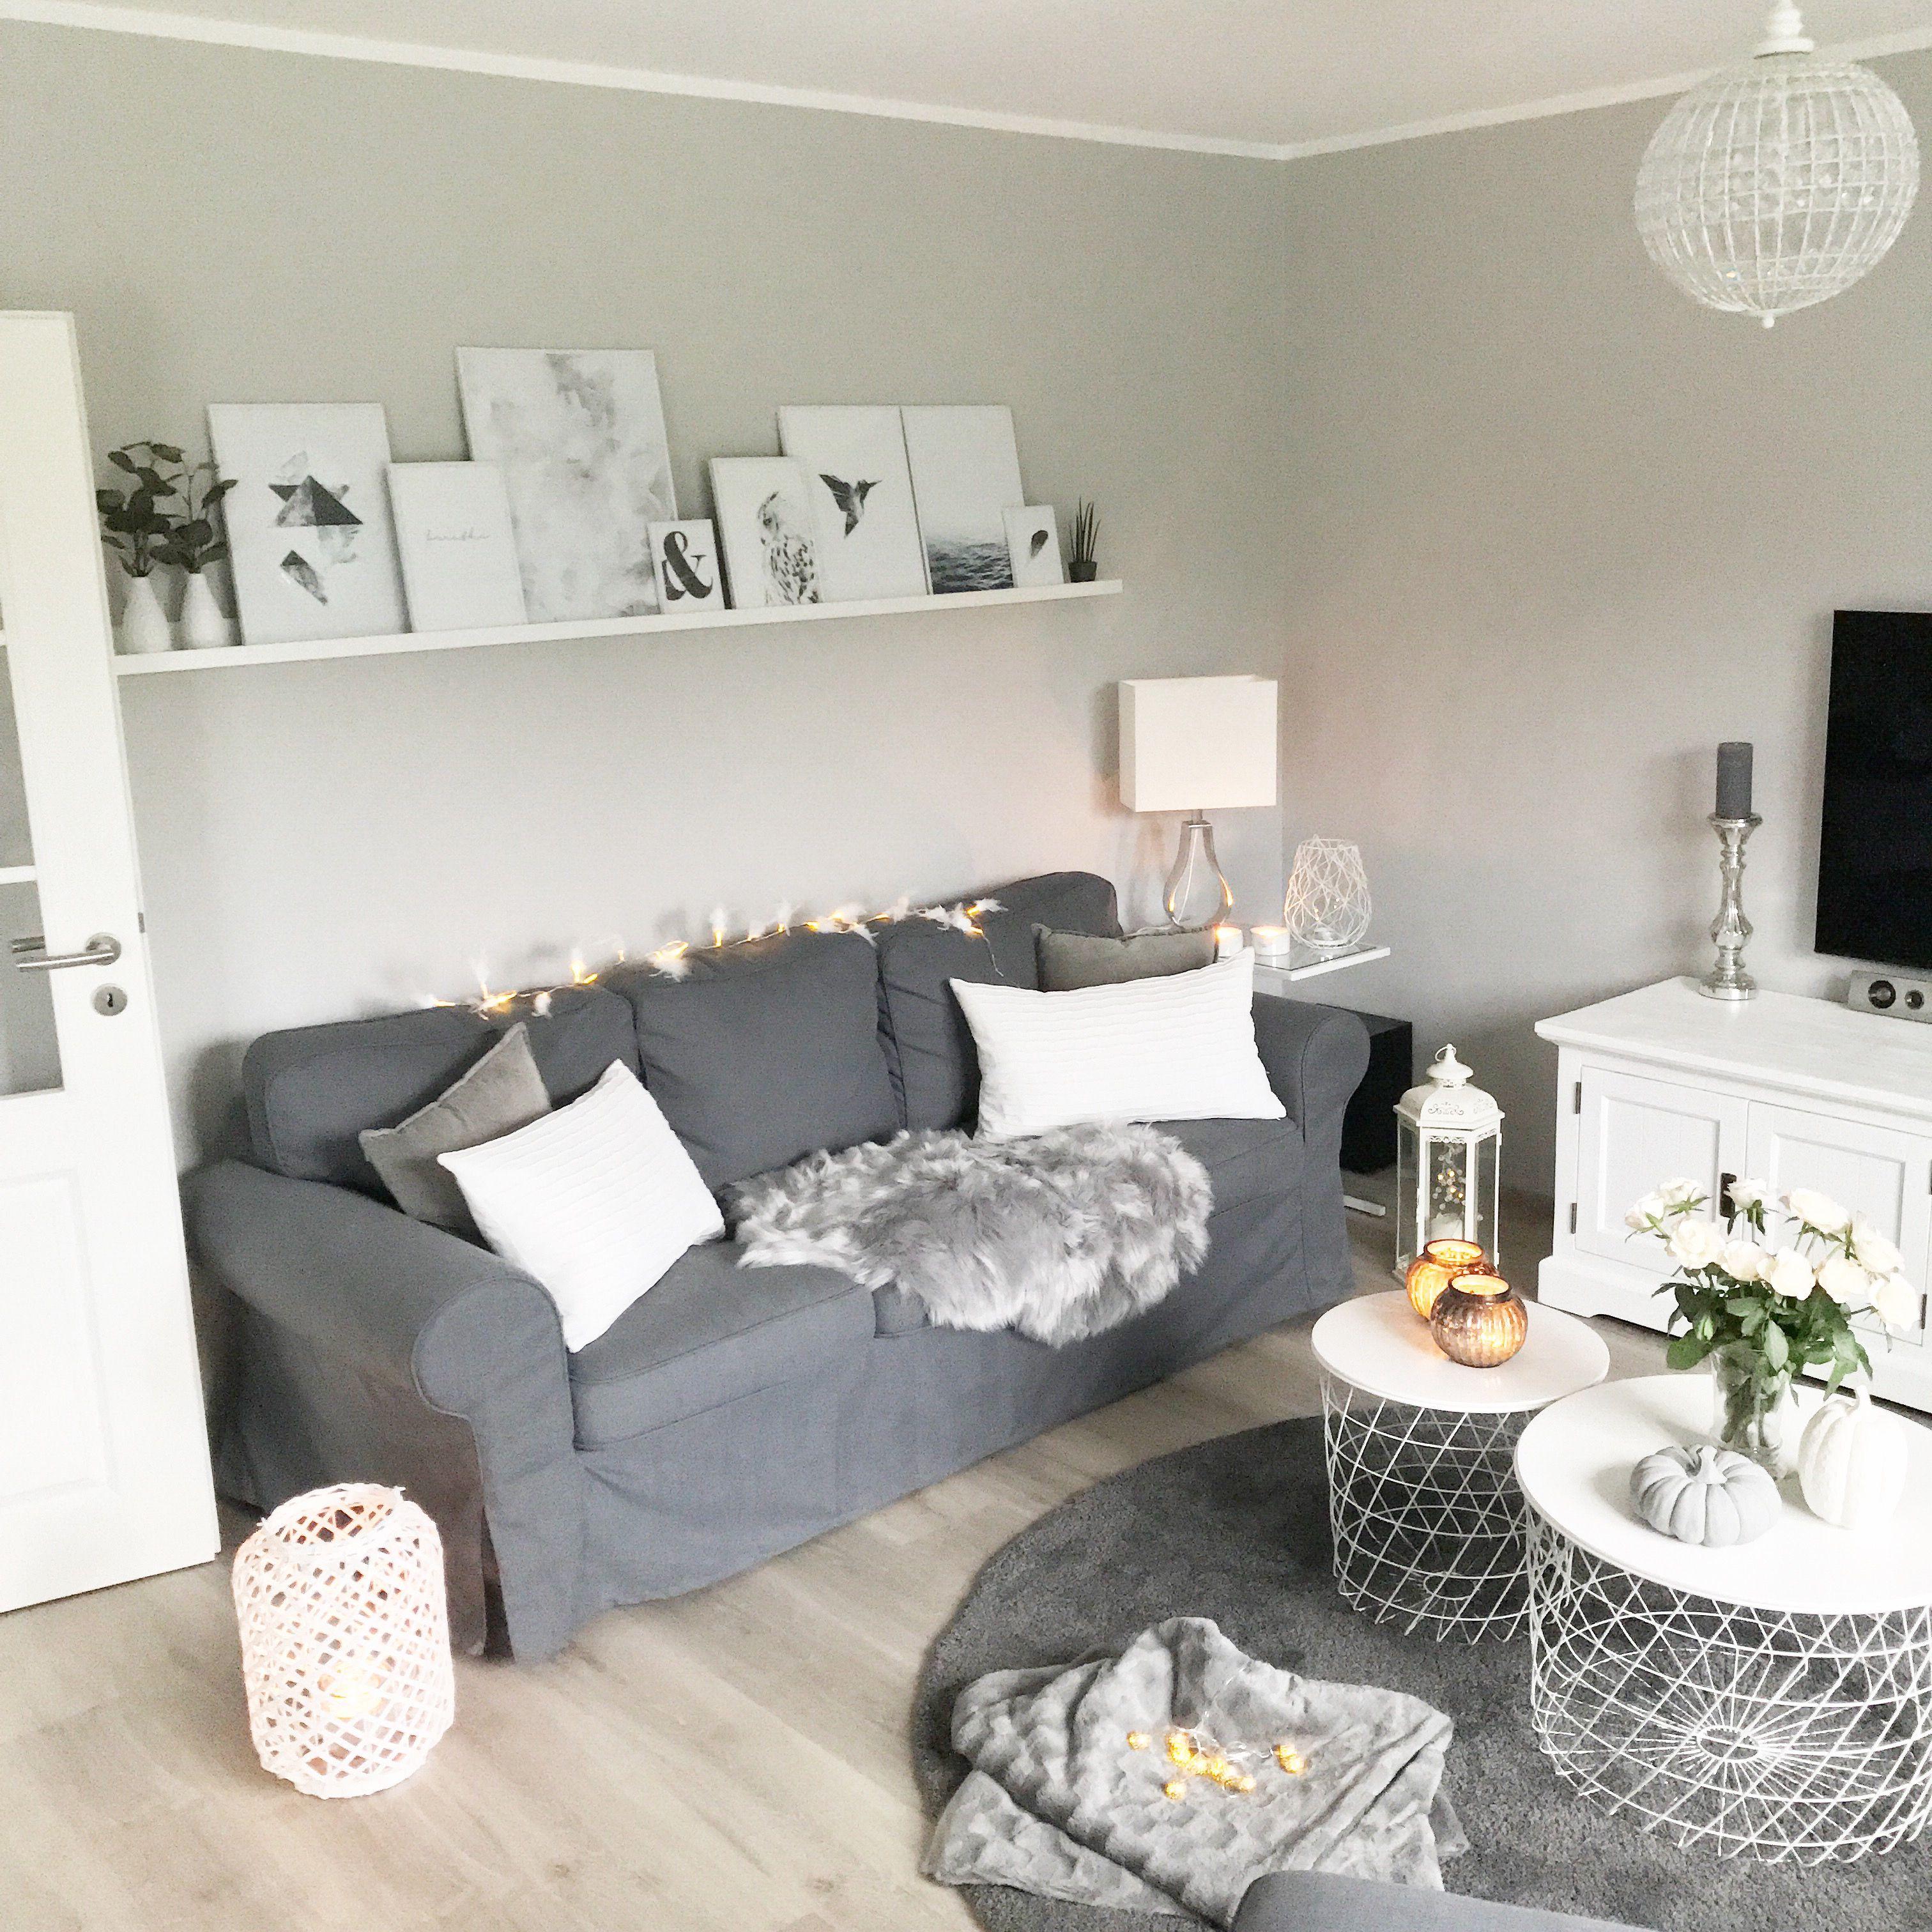 Instagram Wohn Emotion Landhaus Wohnzimmer Livingroom Modern Grau Weiss Home Country Style Curtains Living Room